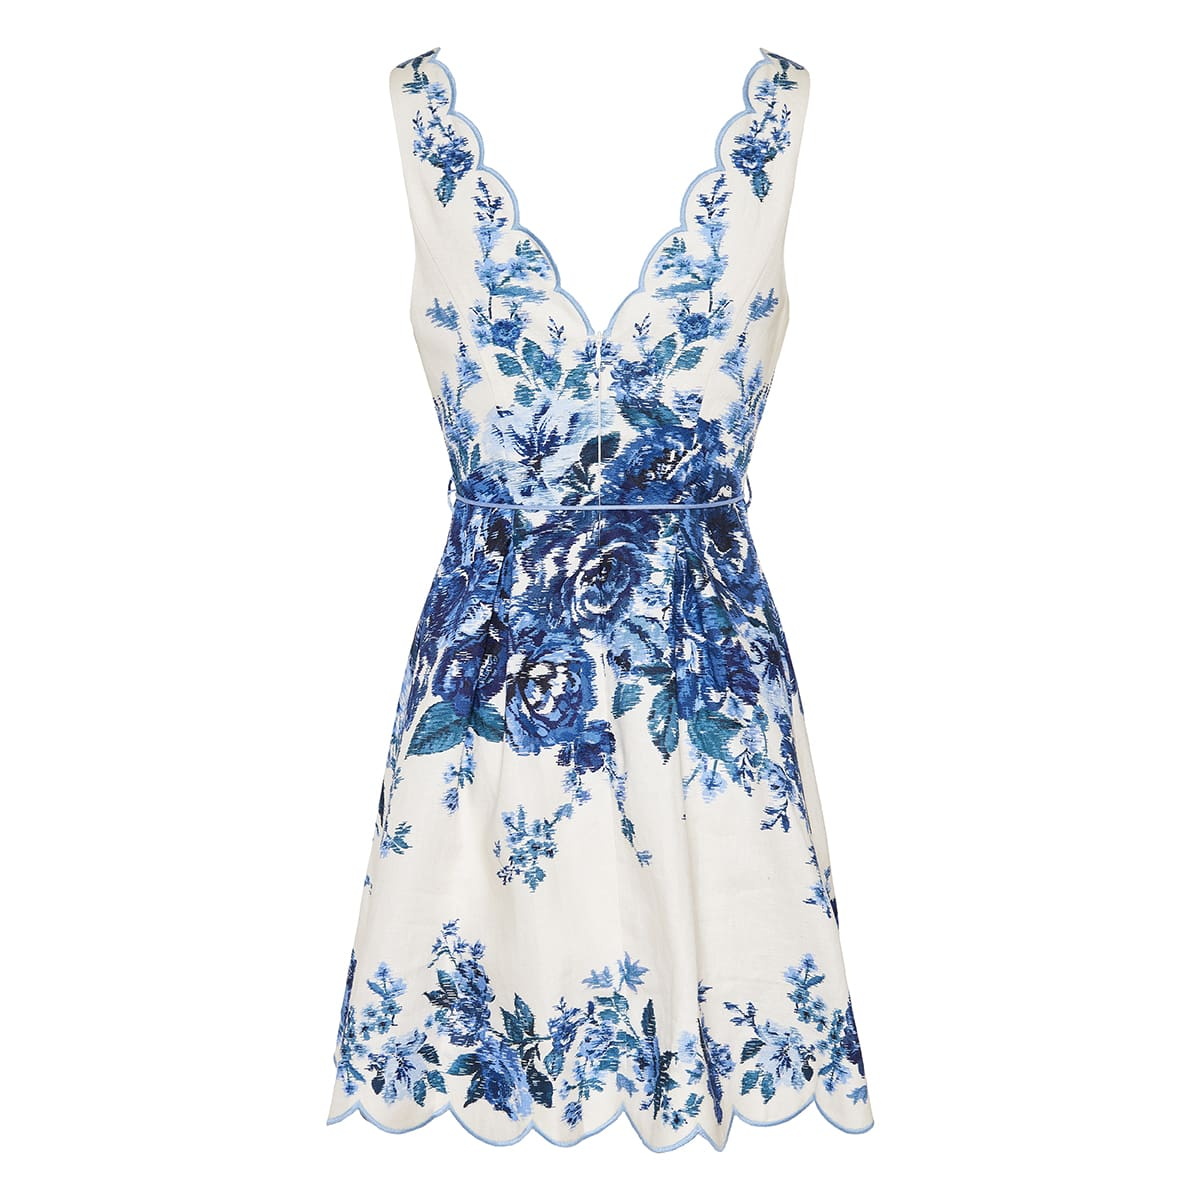 Aliane floral scalloped mini dress